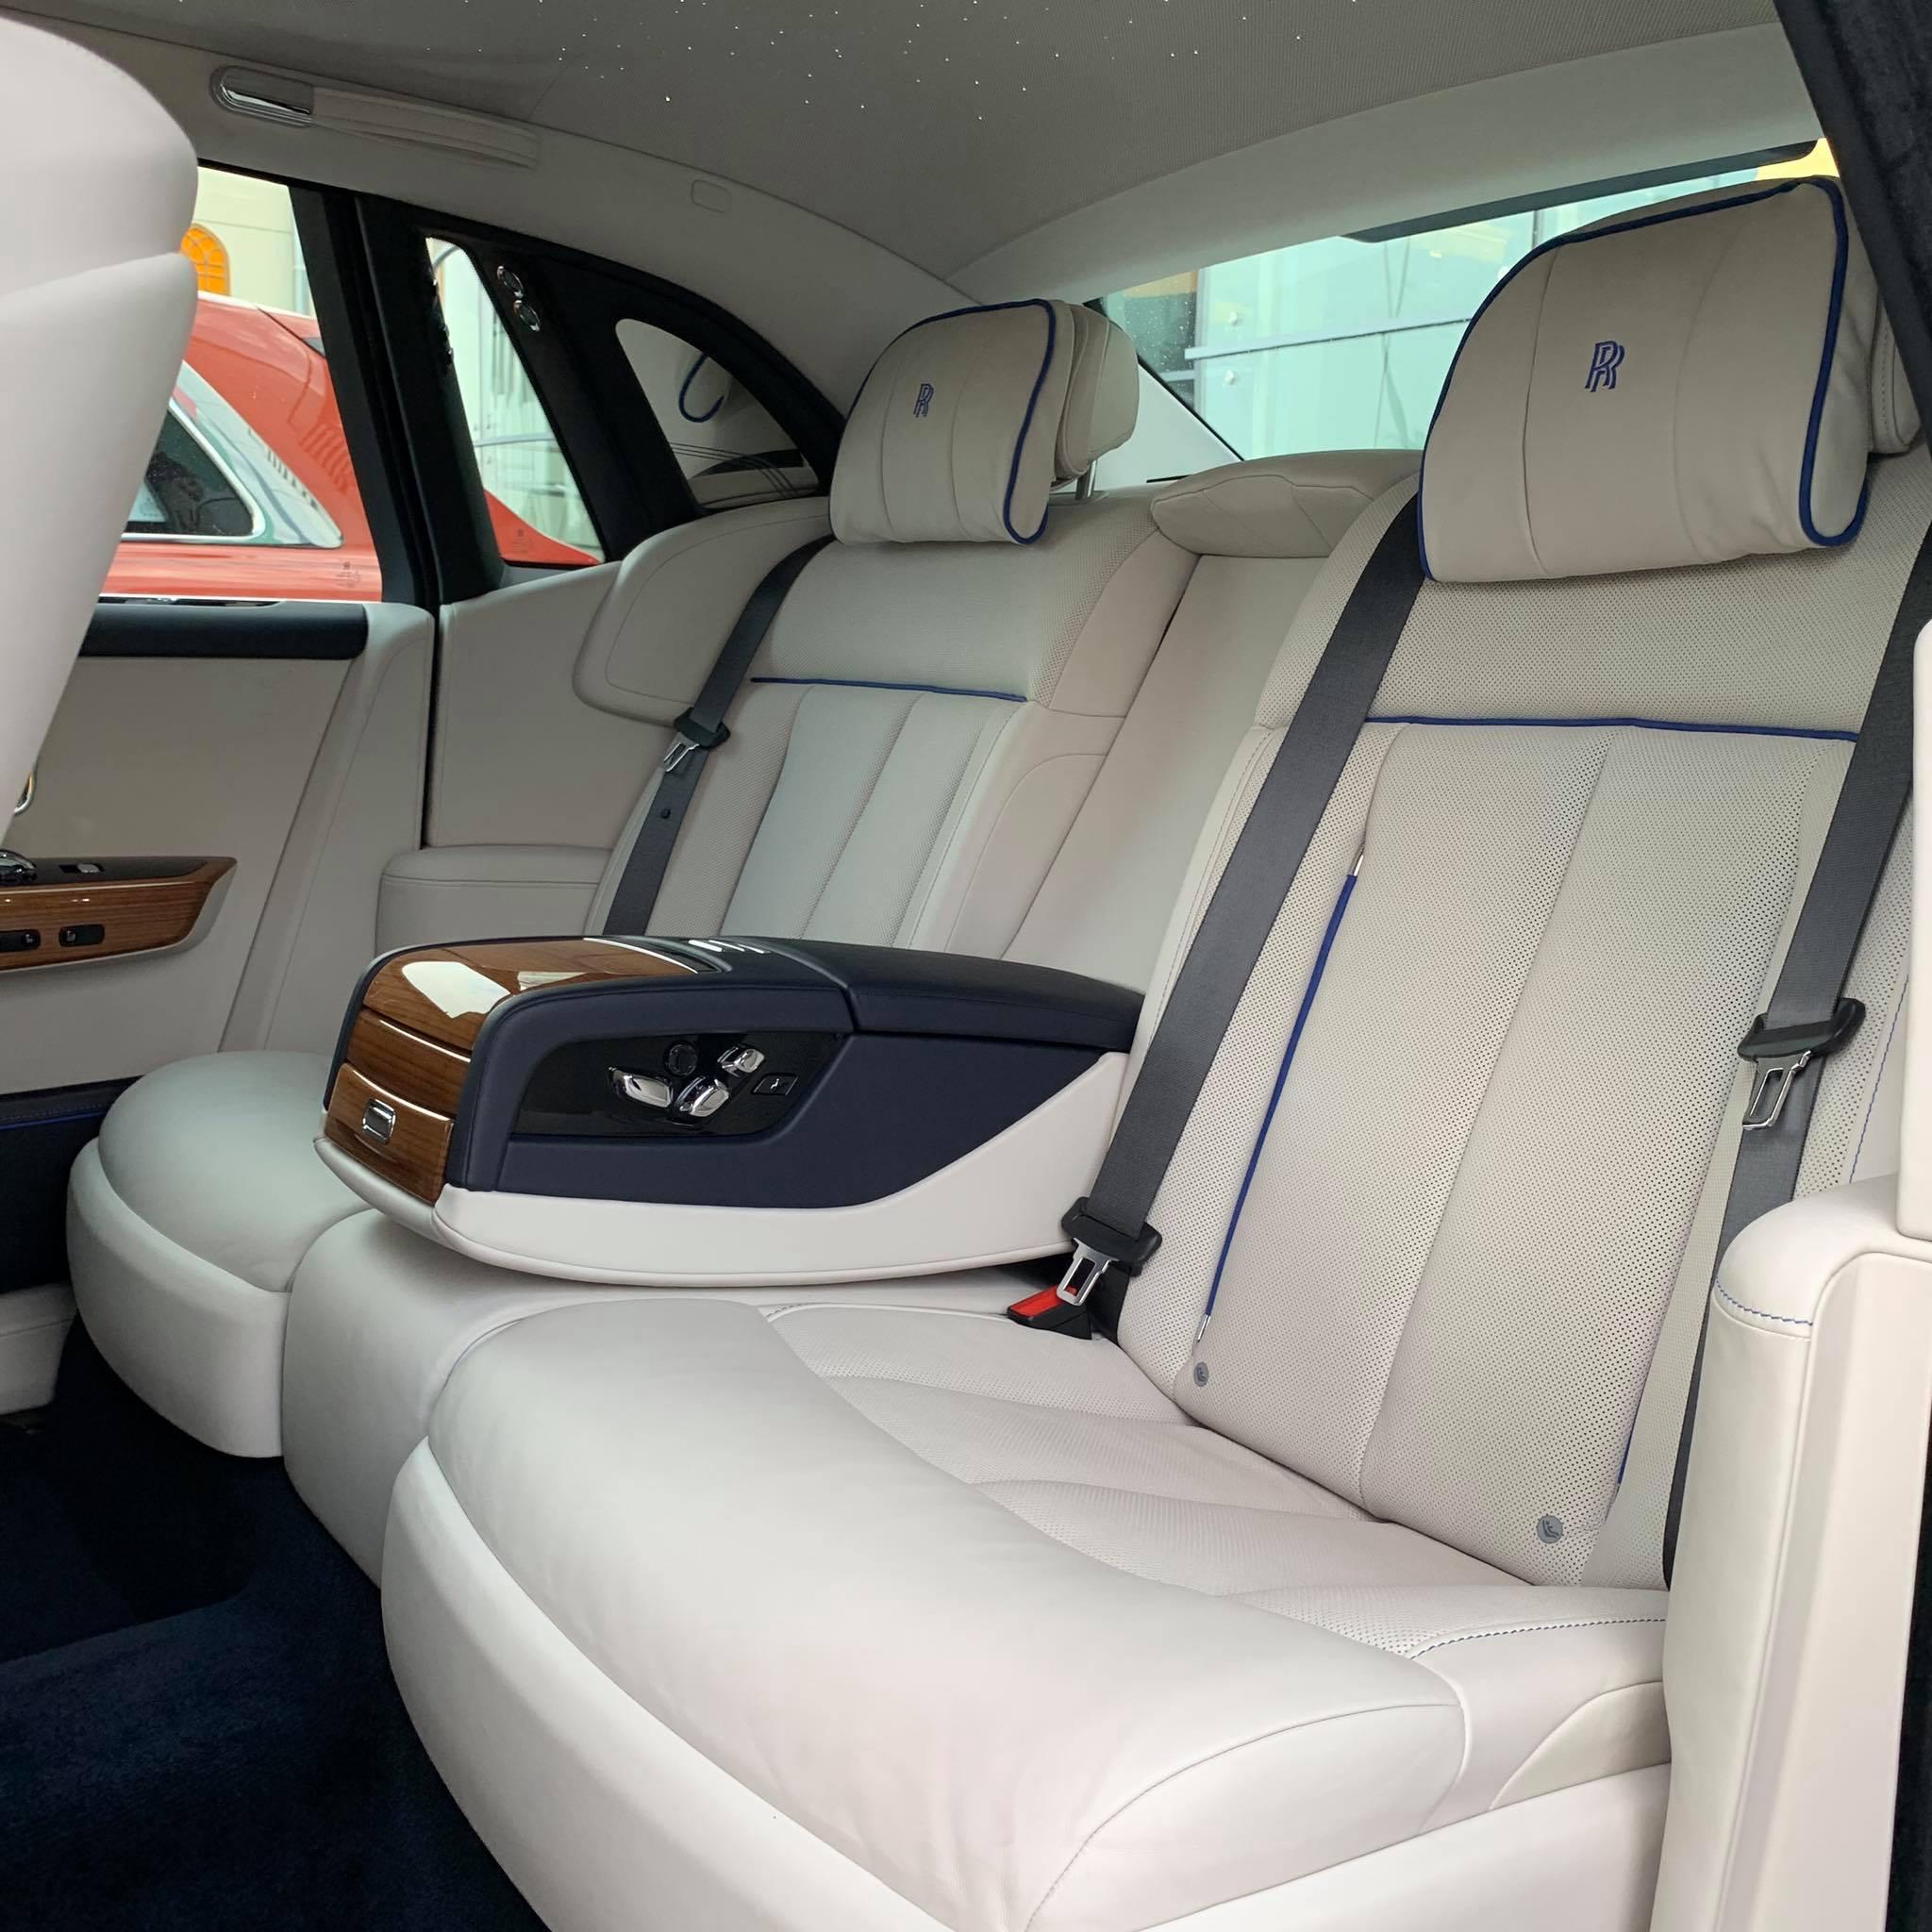 Rolls-Royce_Phantom_Bradley_Theodore_0001